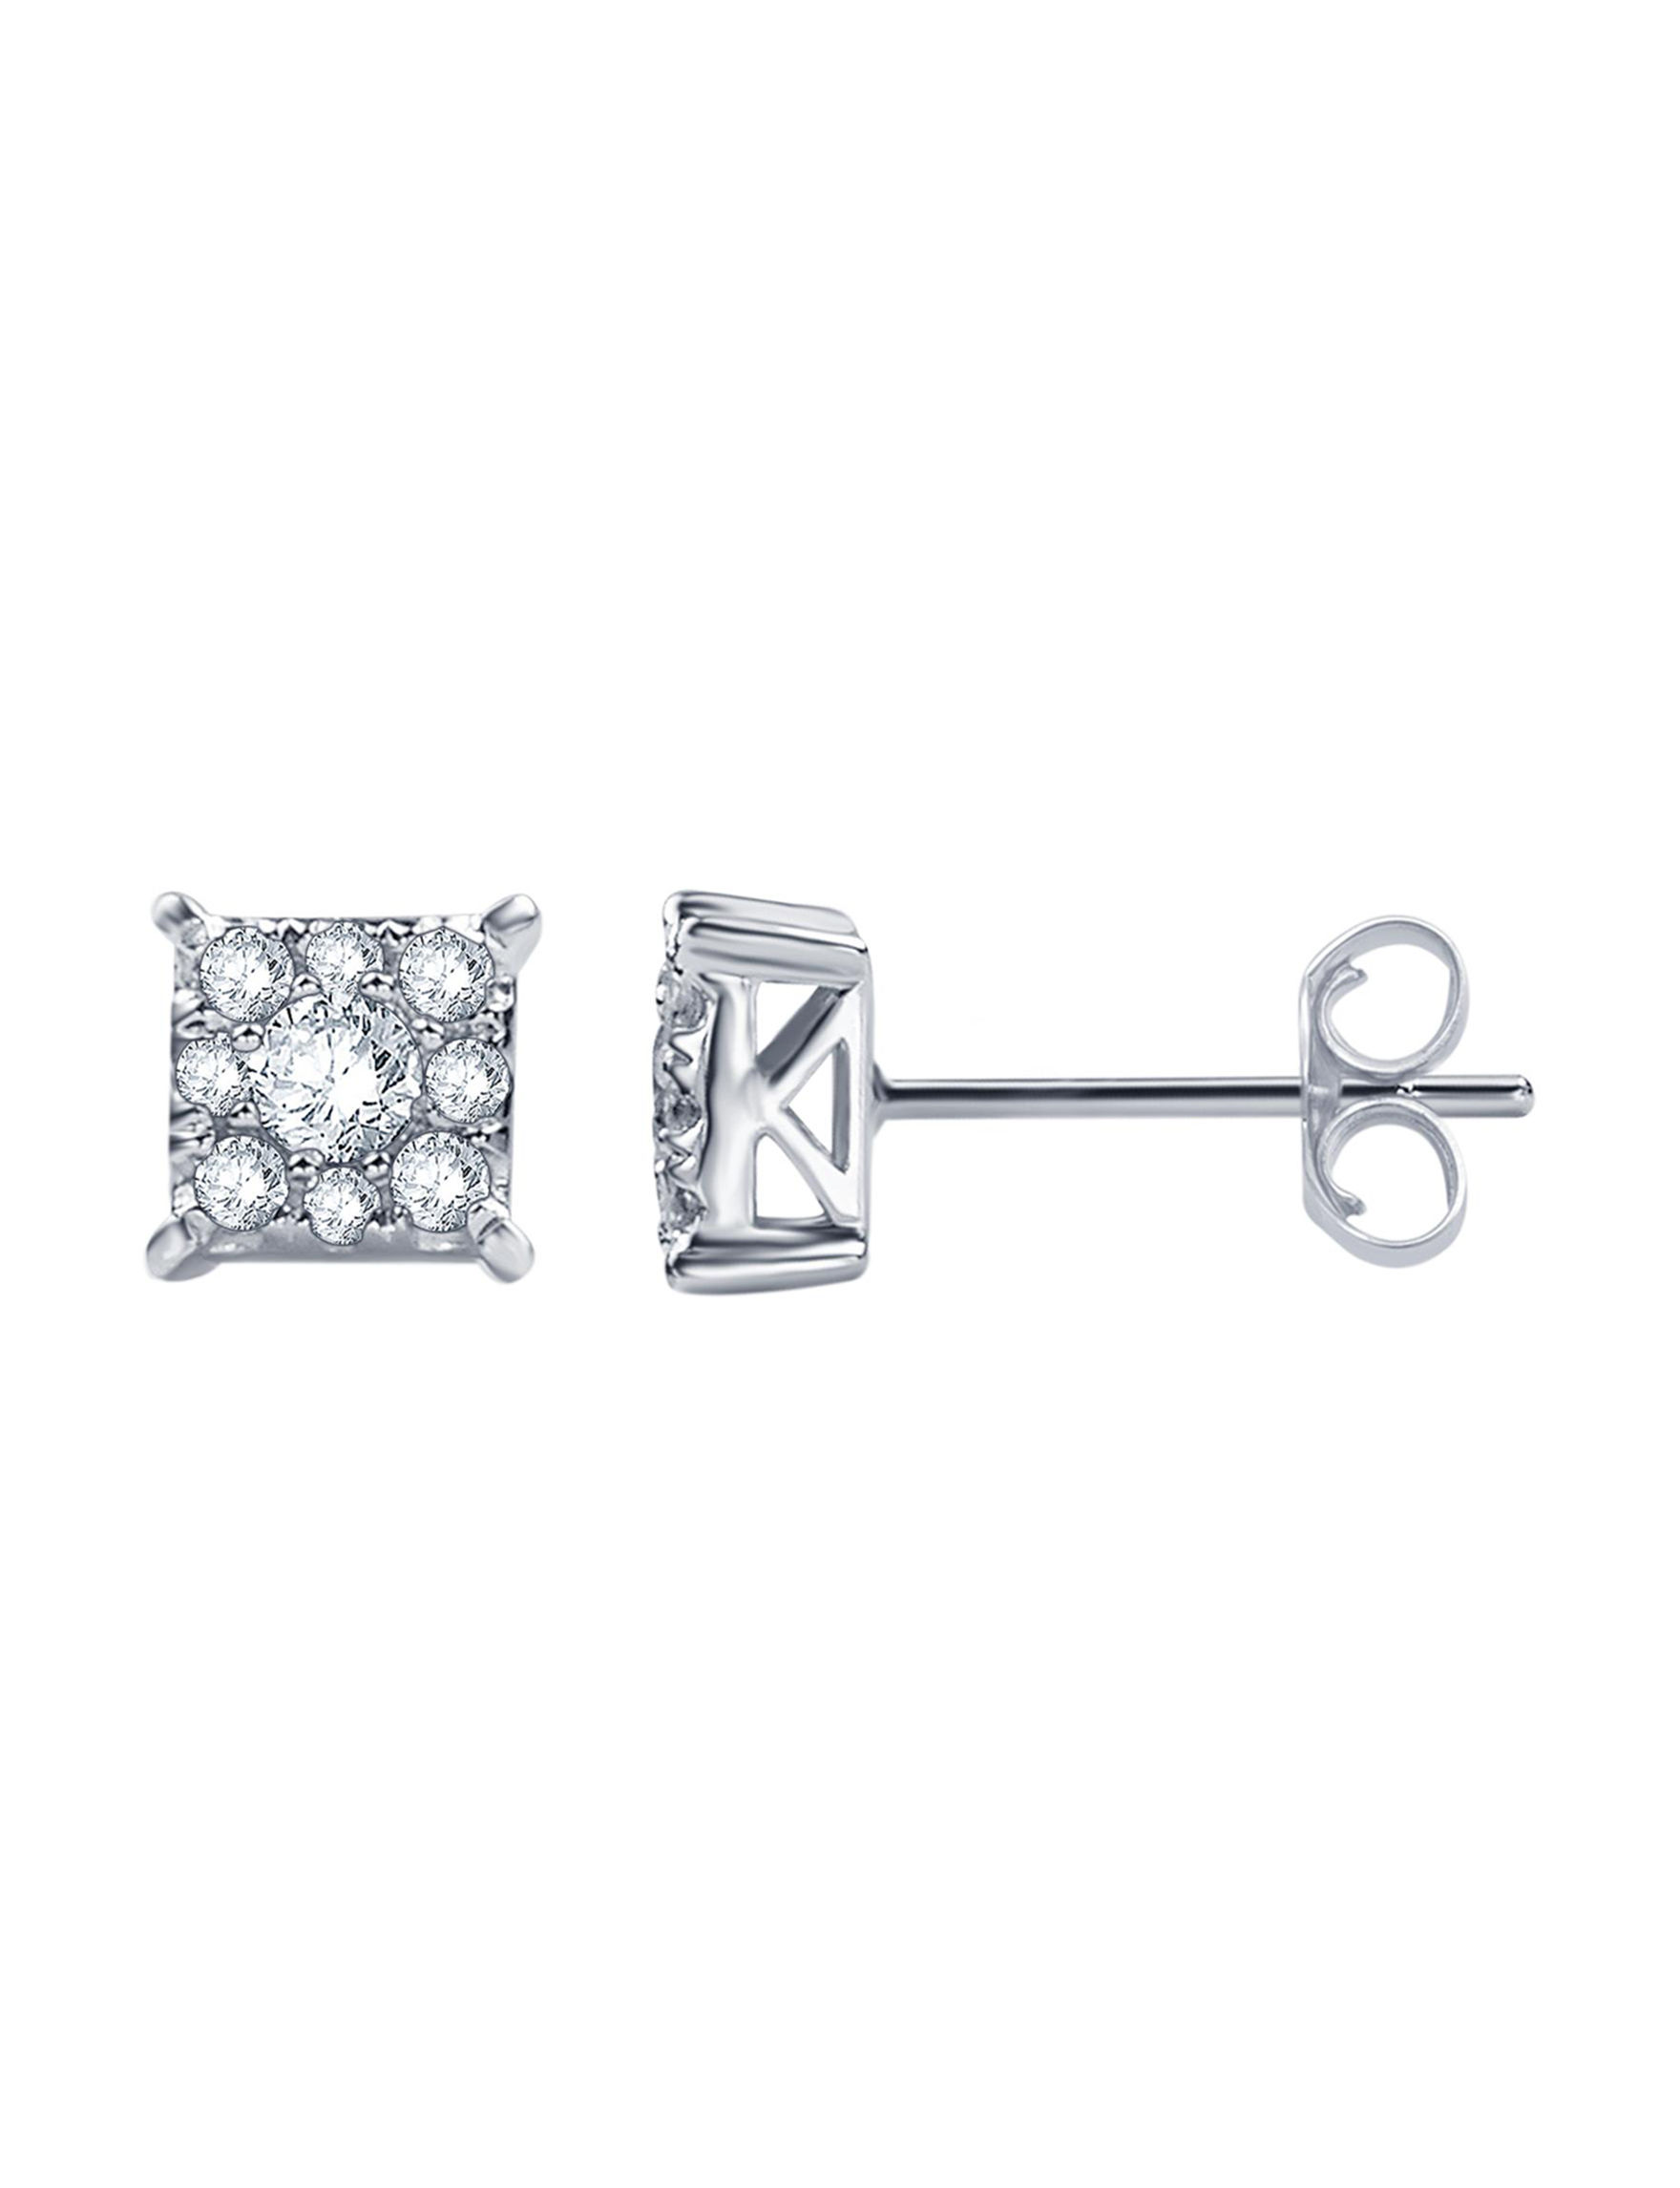 Brilliant Diamond Silver Studs Earrings Fine Jewelry